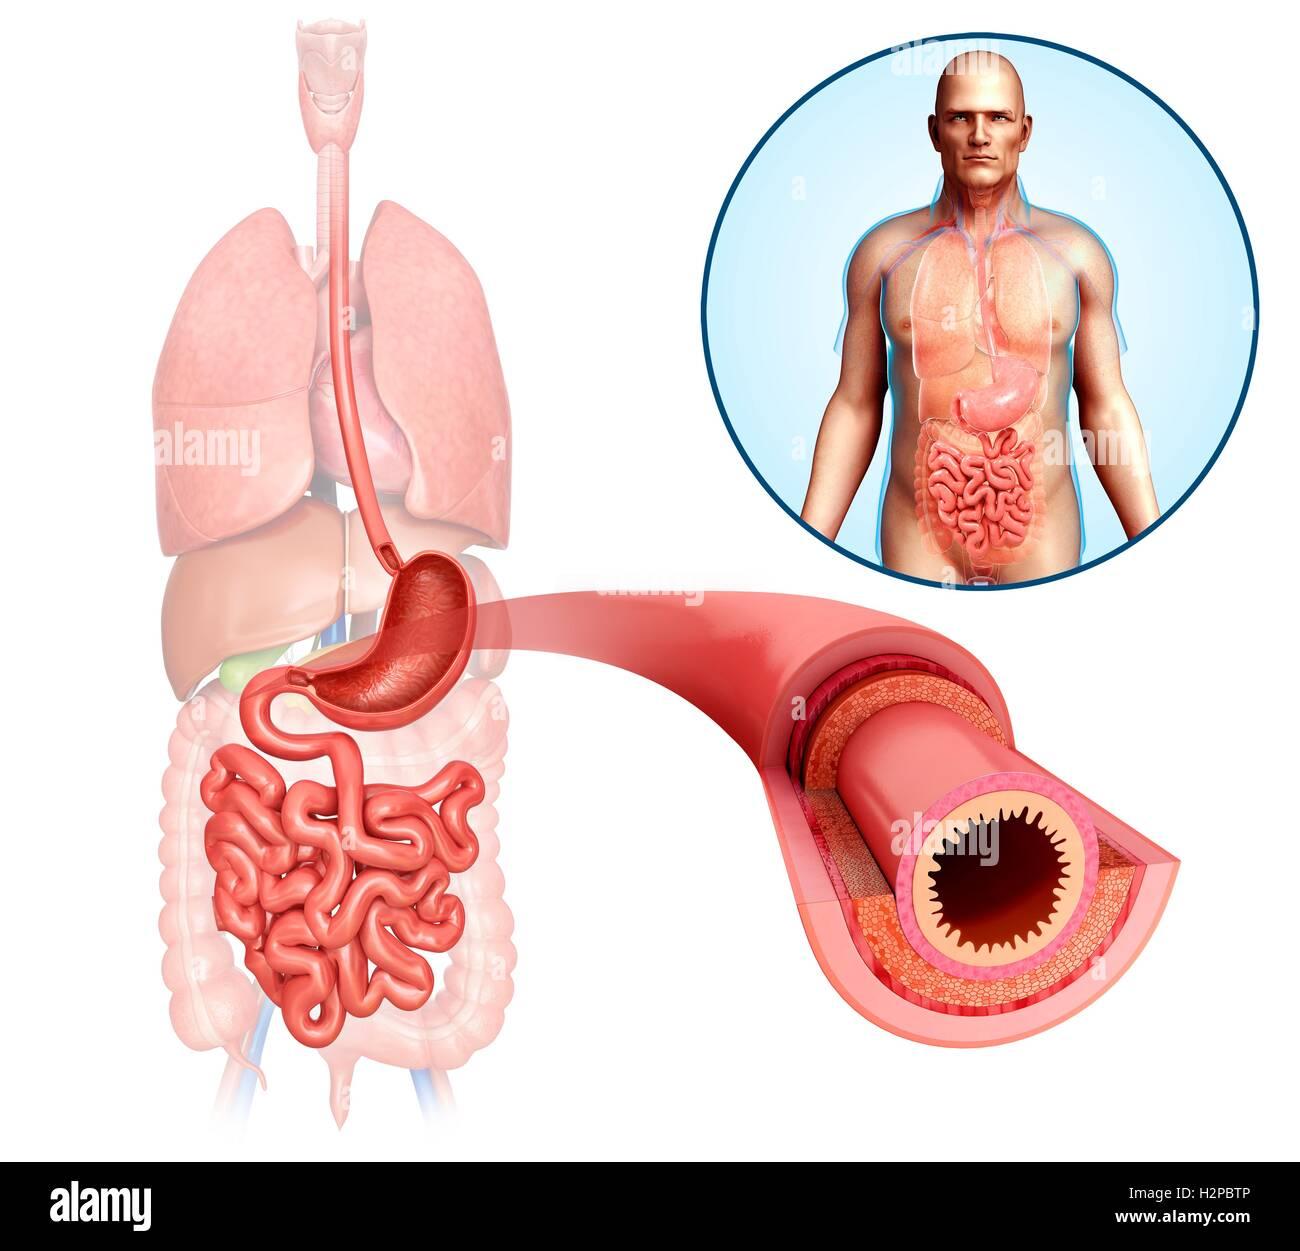 Illustration of male small intestine anatomical layers. - Stock Image